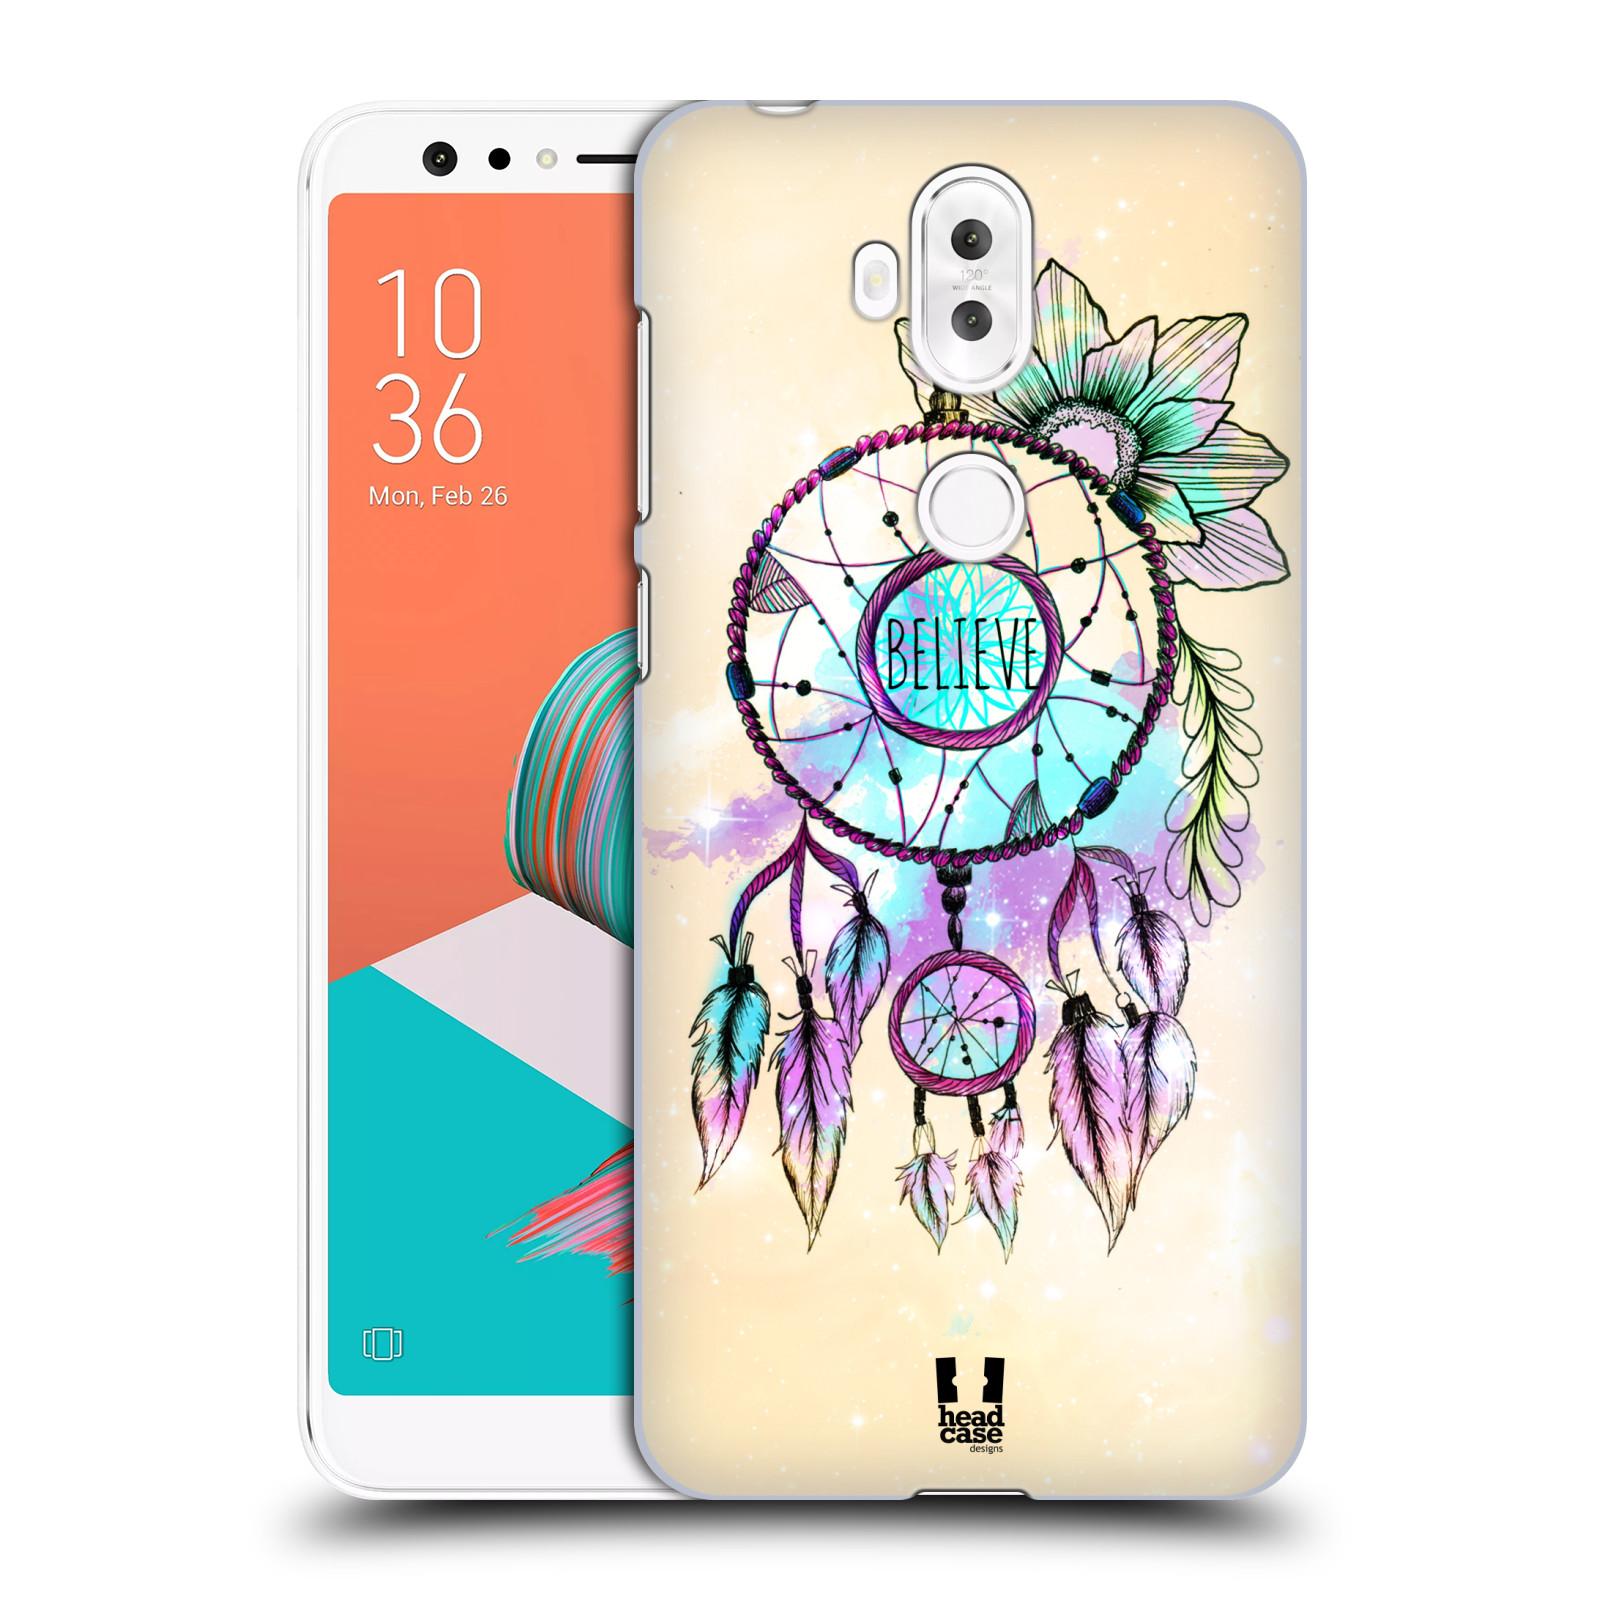 Plastové pouzdro na mobil Asus ZenFone 5 Lite ZC600KL - Head Case - MIX BELIEVE